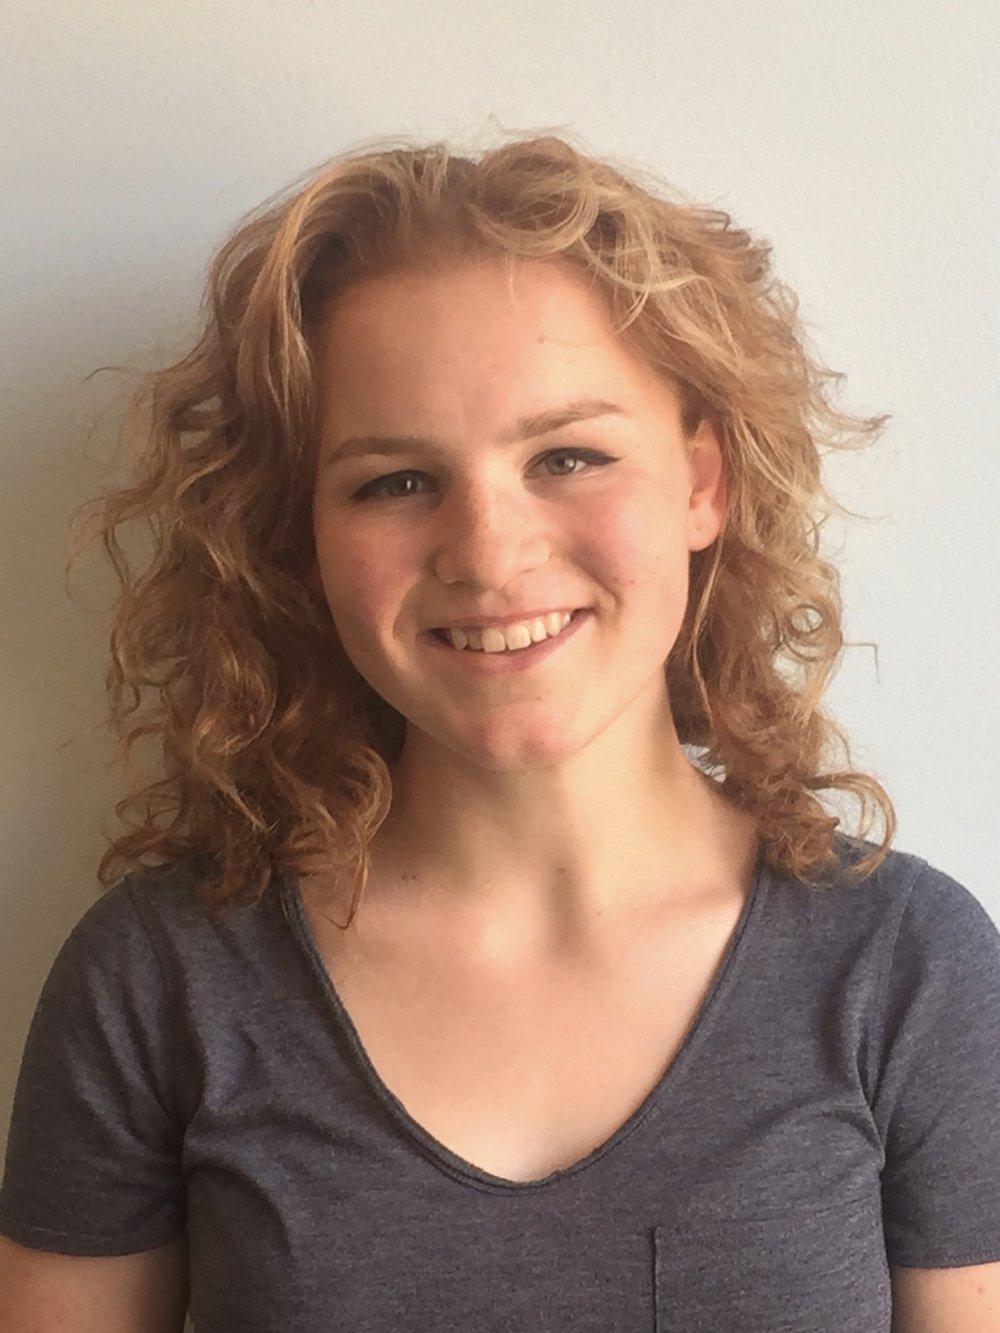 Kira  - High school student charles Wright Acad.  - igem member 2018